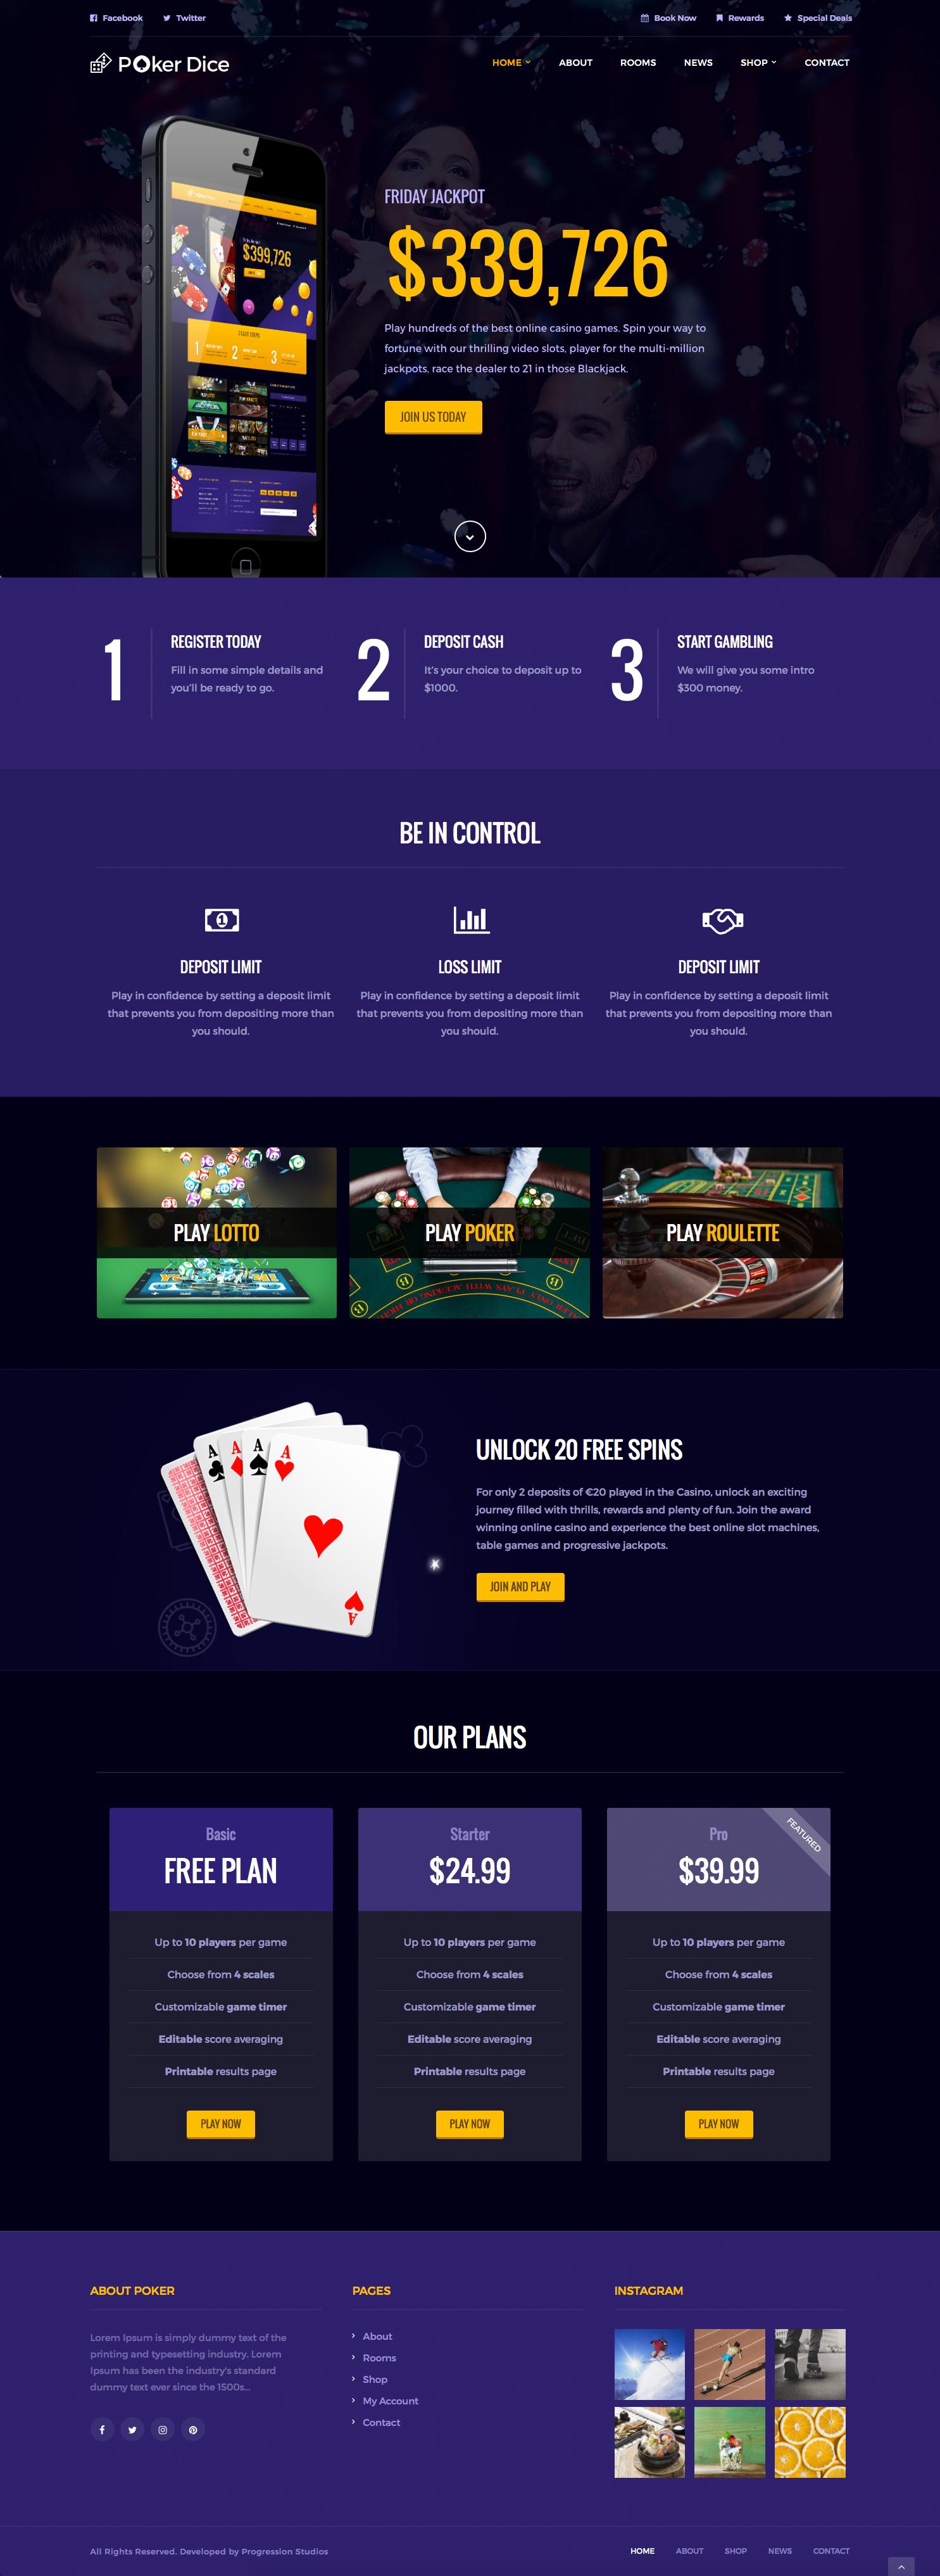 Casino poker web site the office casino night full episode